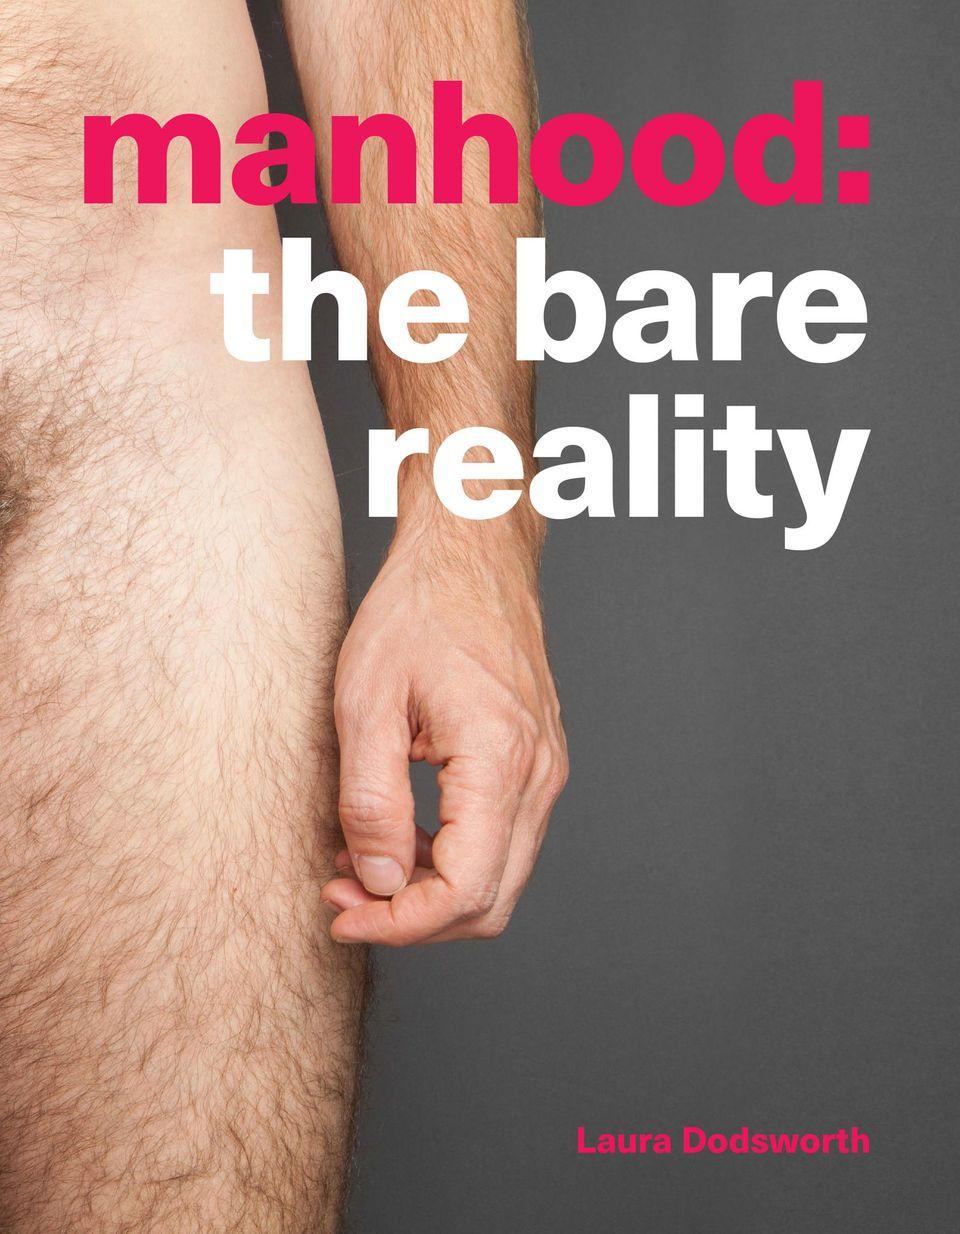 Manhood-Buchcover